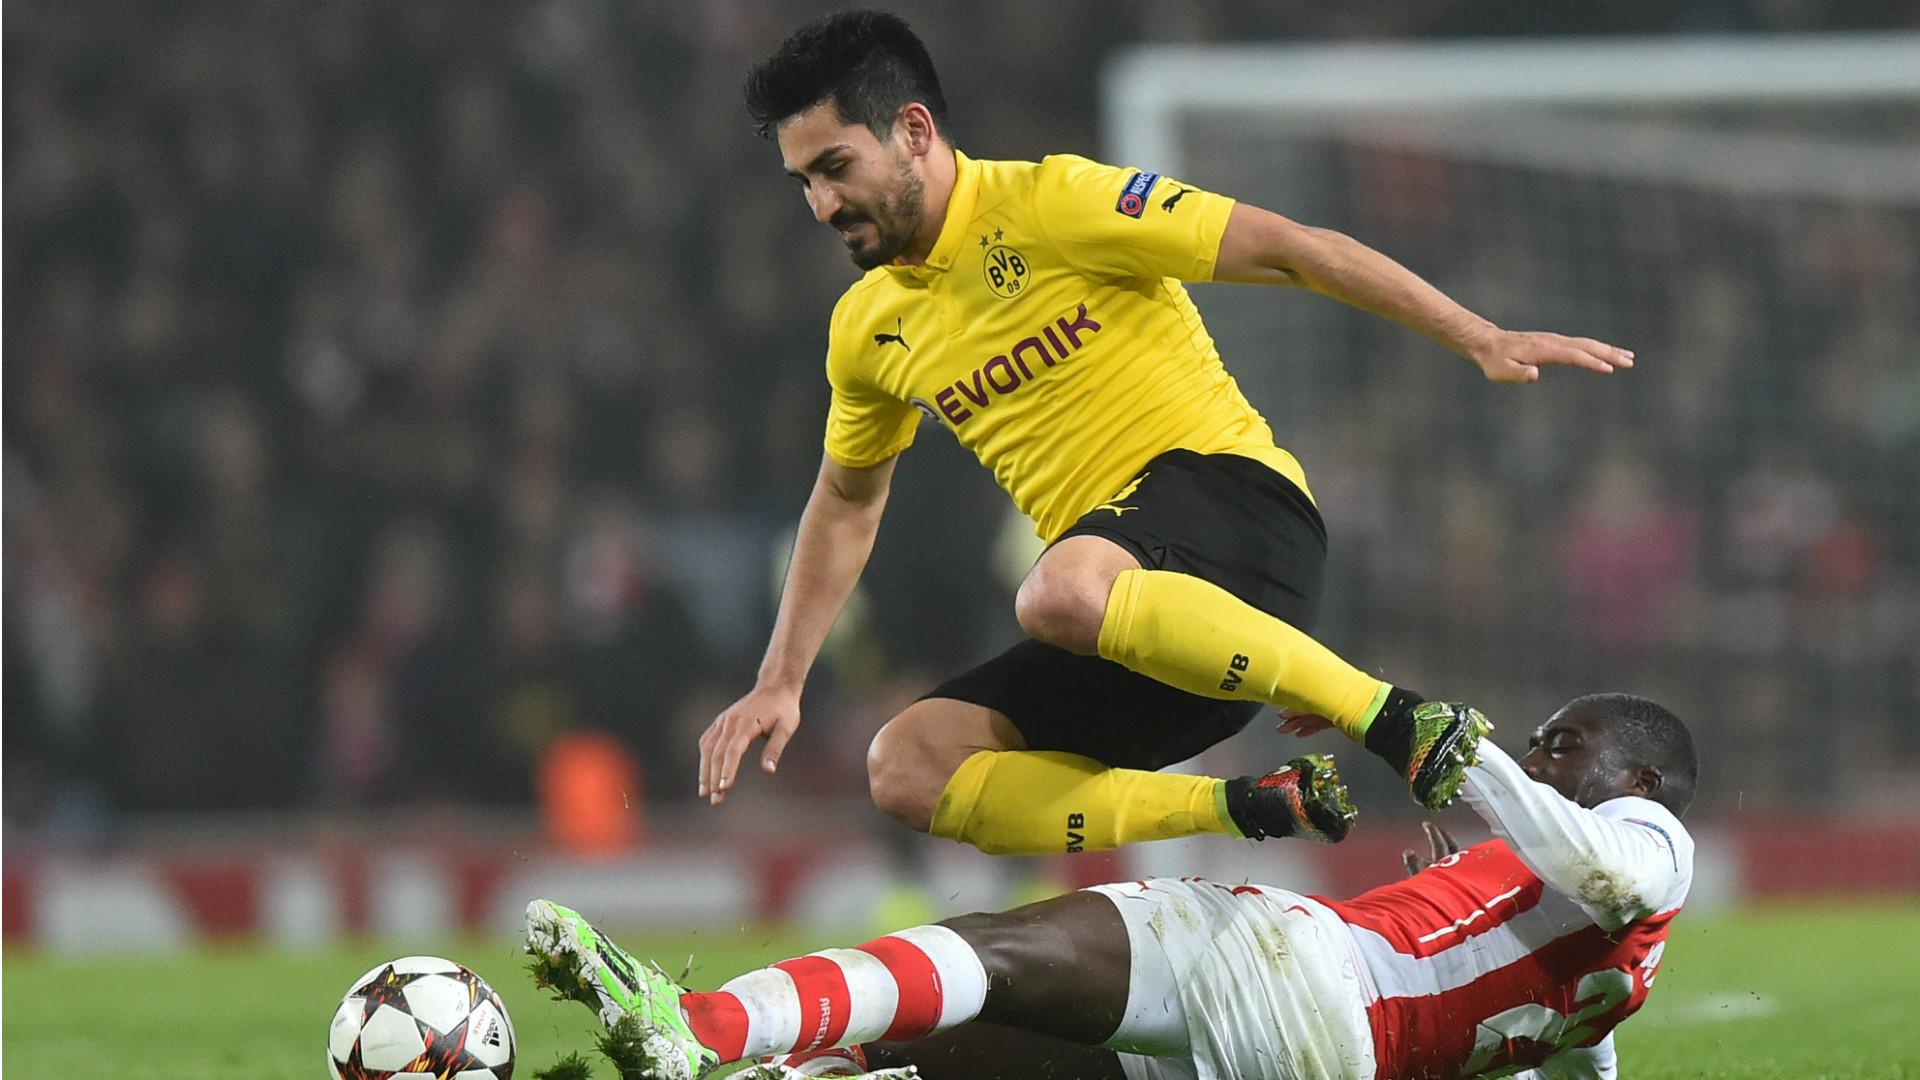 Image Result For Eintracht Frankfurt Vs Borussia Dortmund En Vivo Eliminatorias